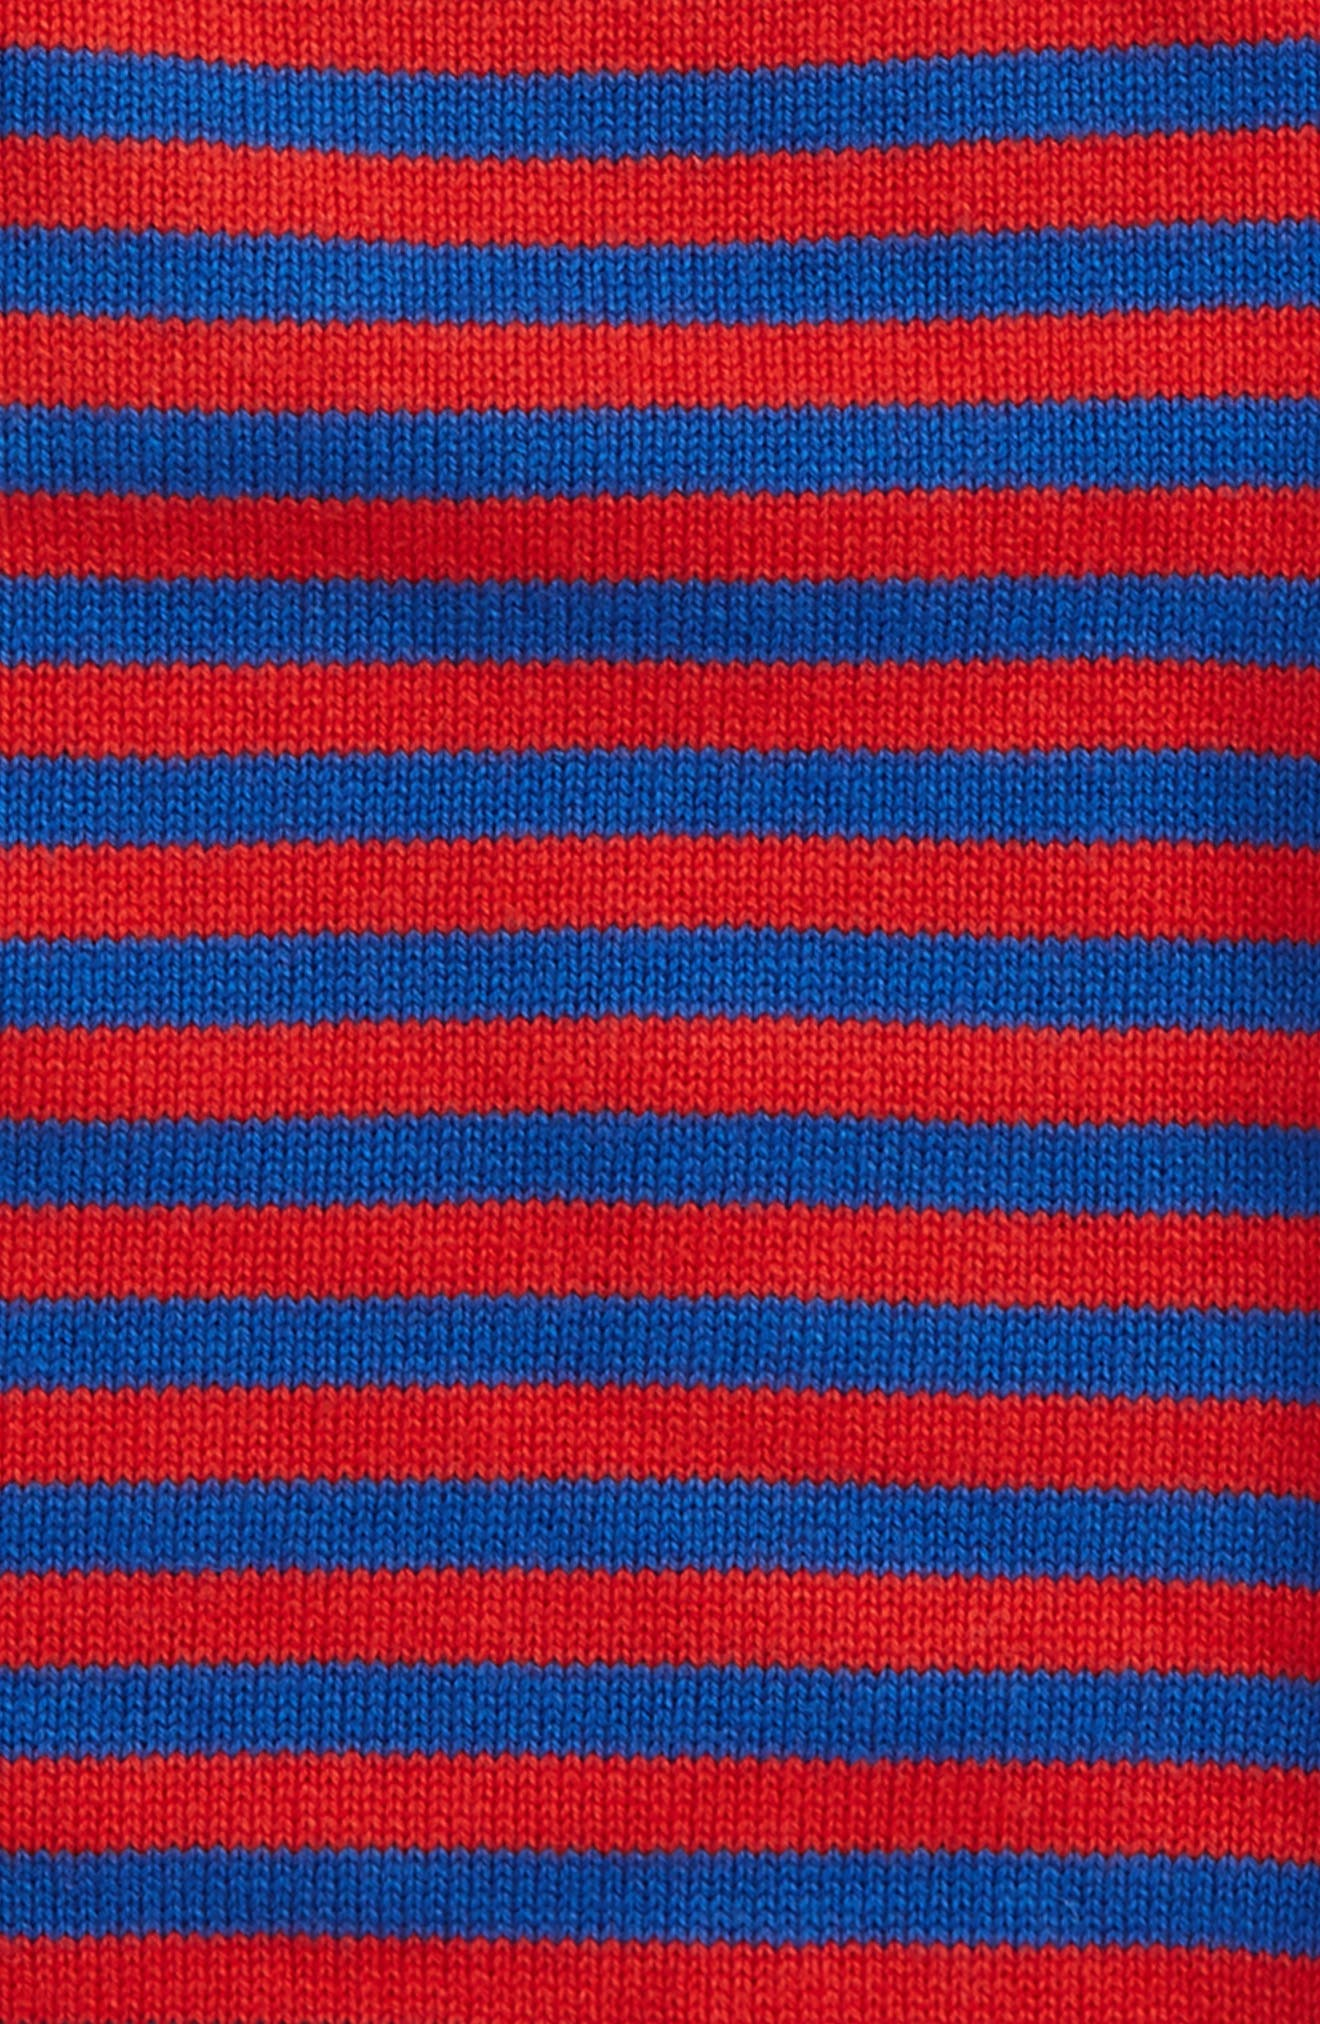 Alternate Image 3  - Mini Boden Hotchpotch Sweater (Toddler Boys, Little Boys & Big Boys)